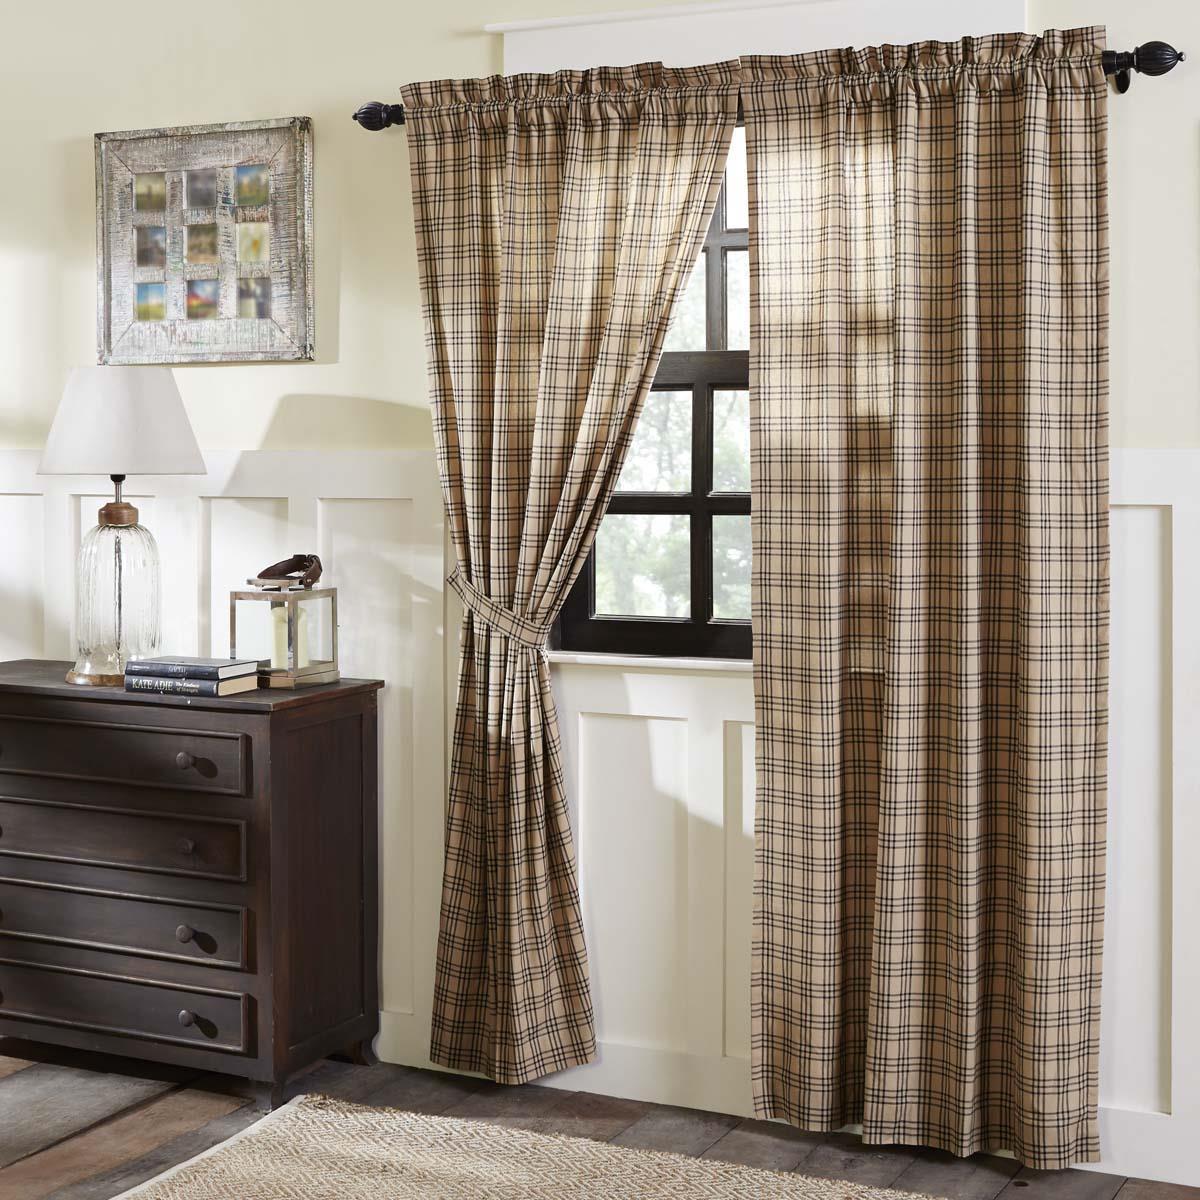 Sawyer Mill Curtains - 840528162534